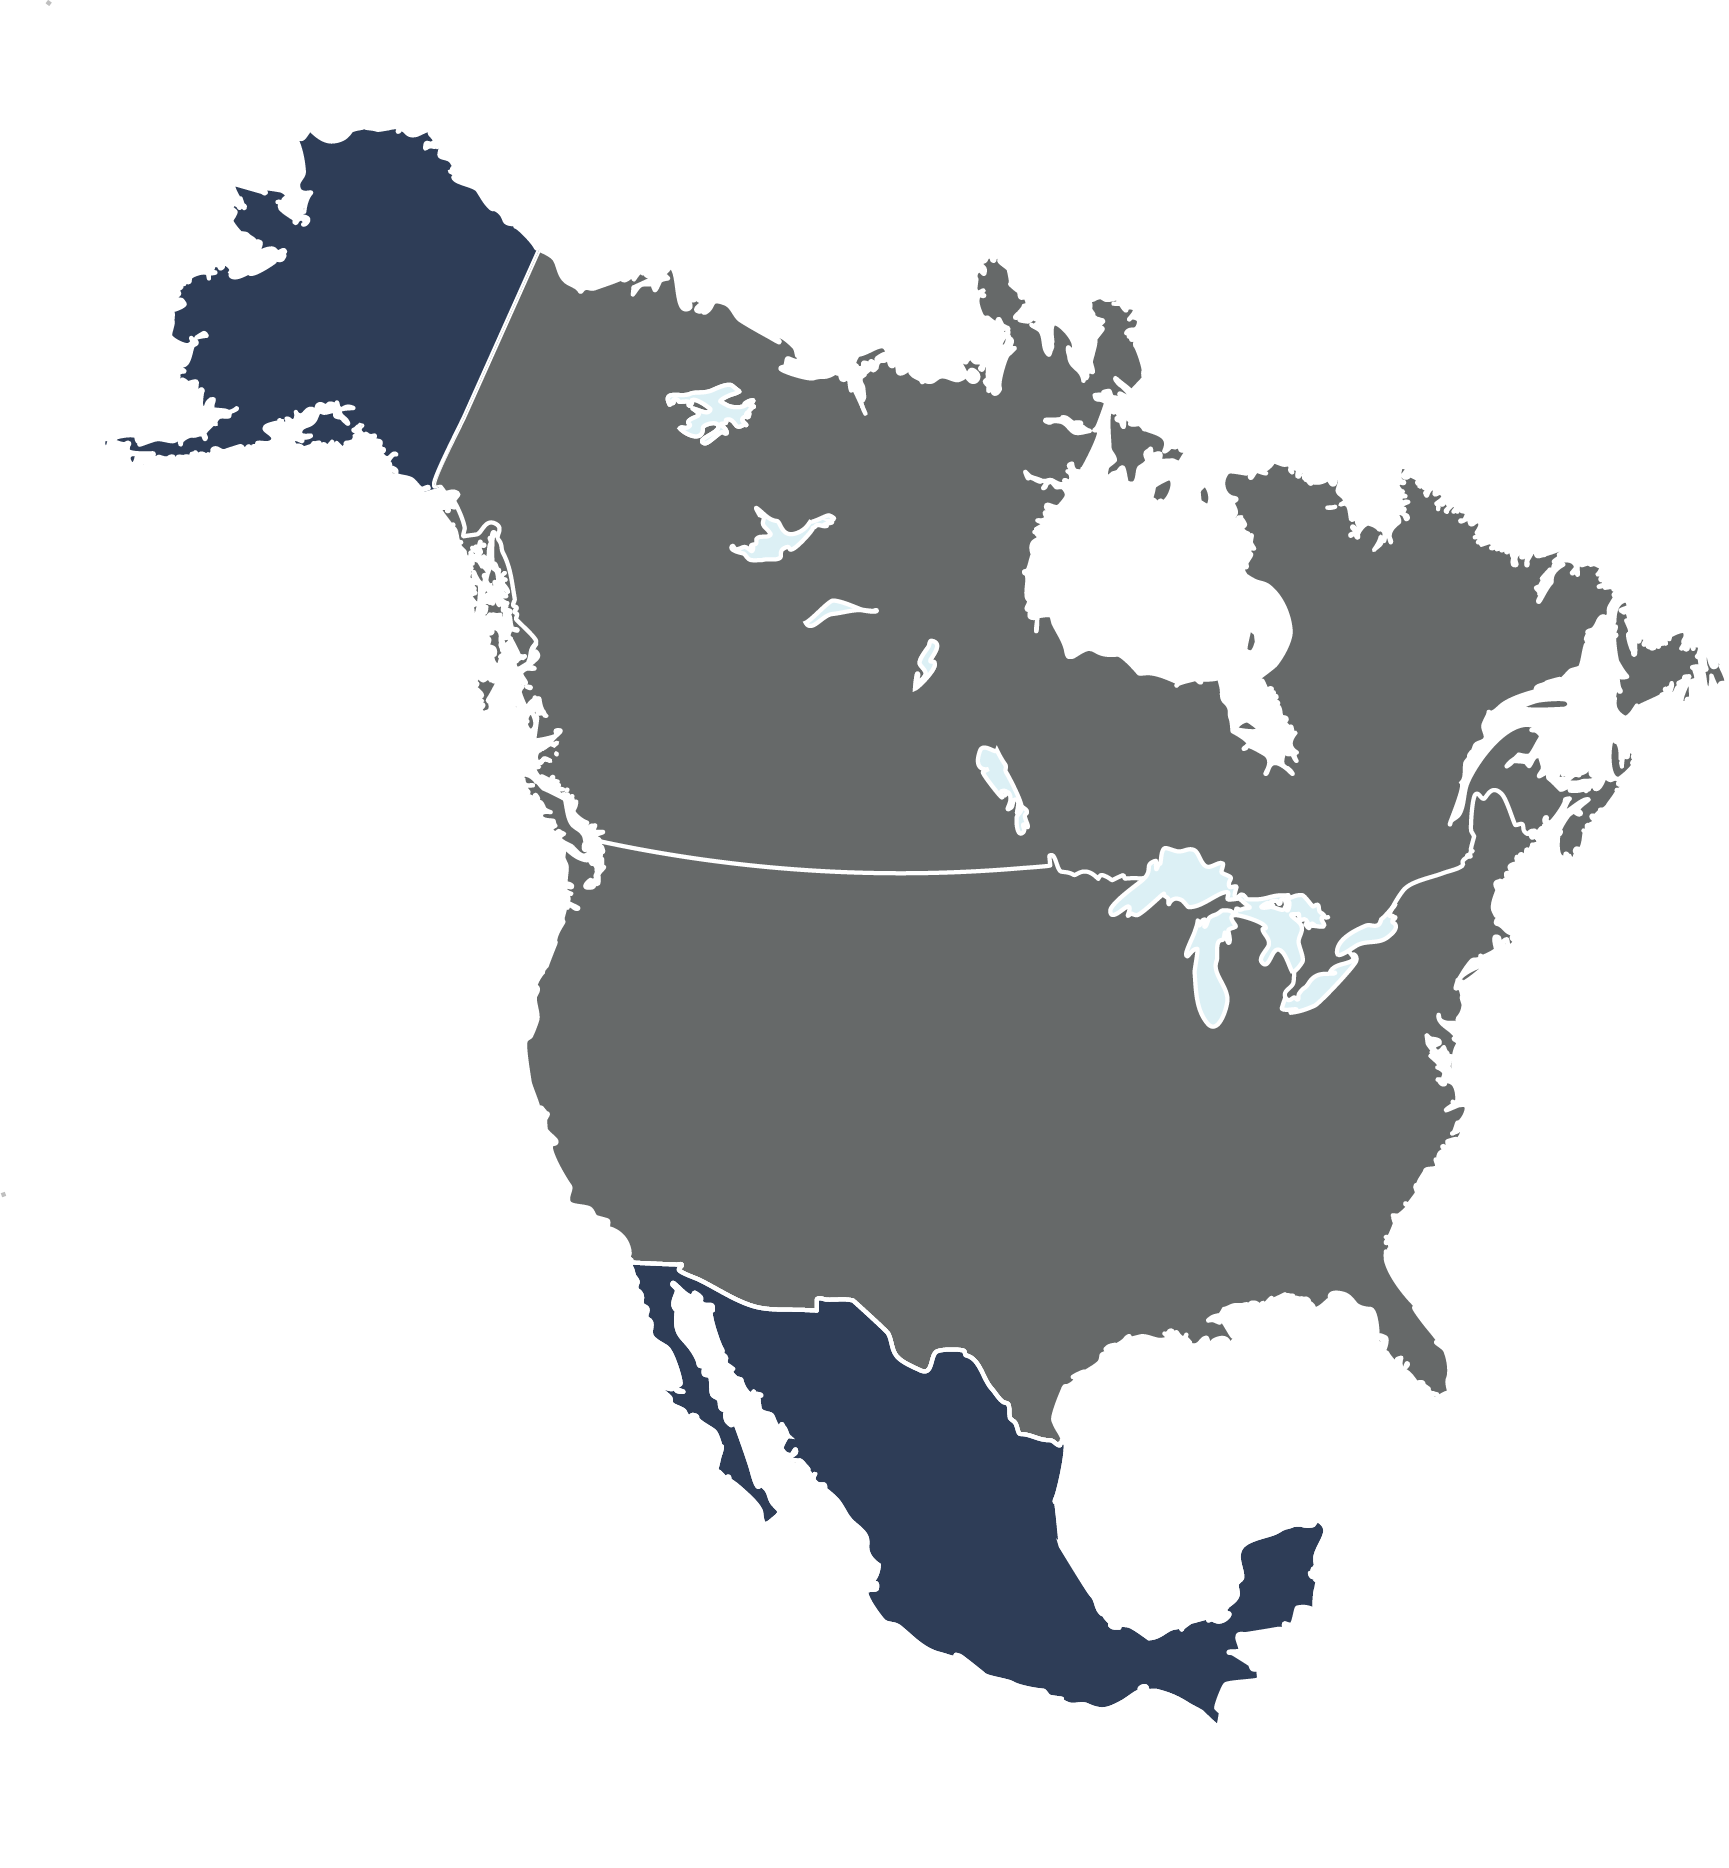 Millrock Resources - Alaska and Mexico